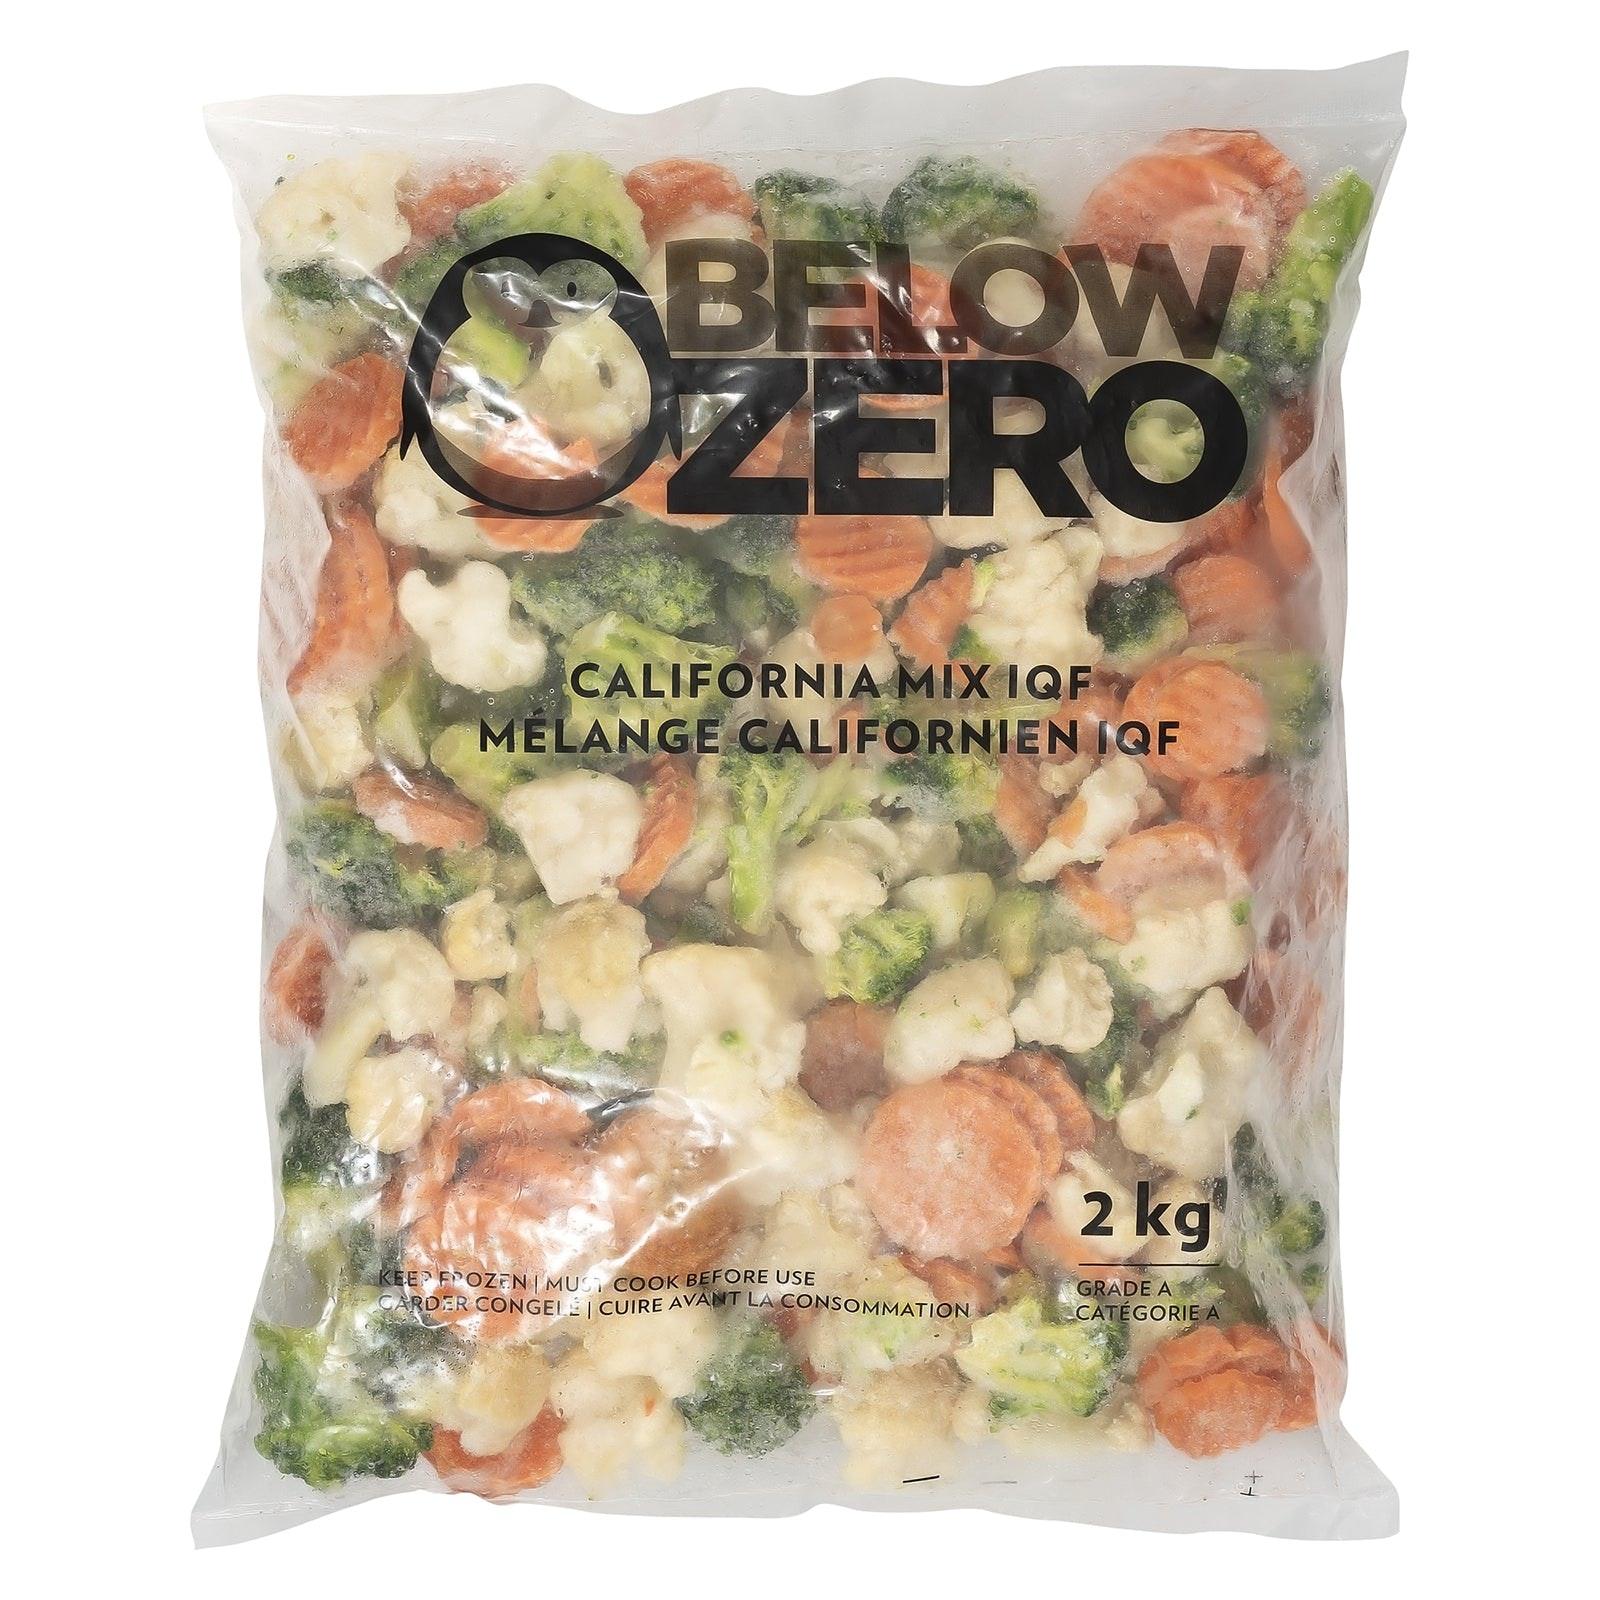 BELOW ZERO California mixed vegetables